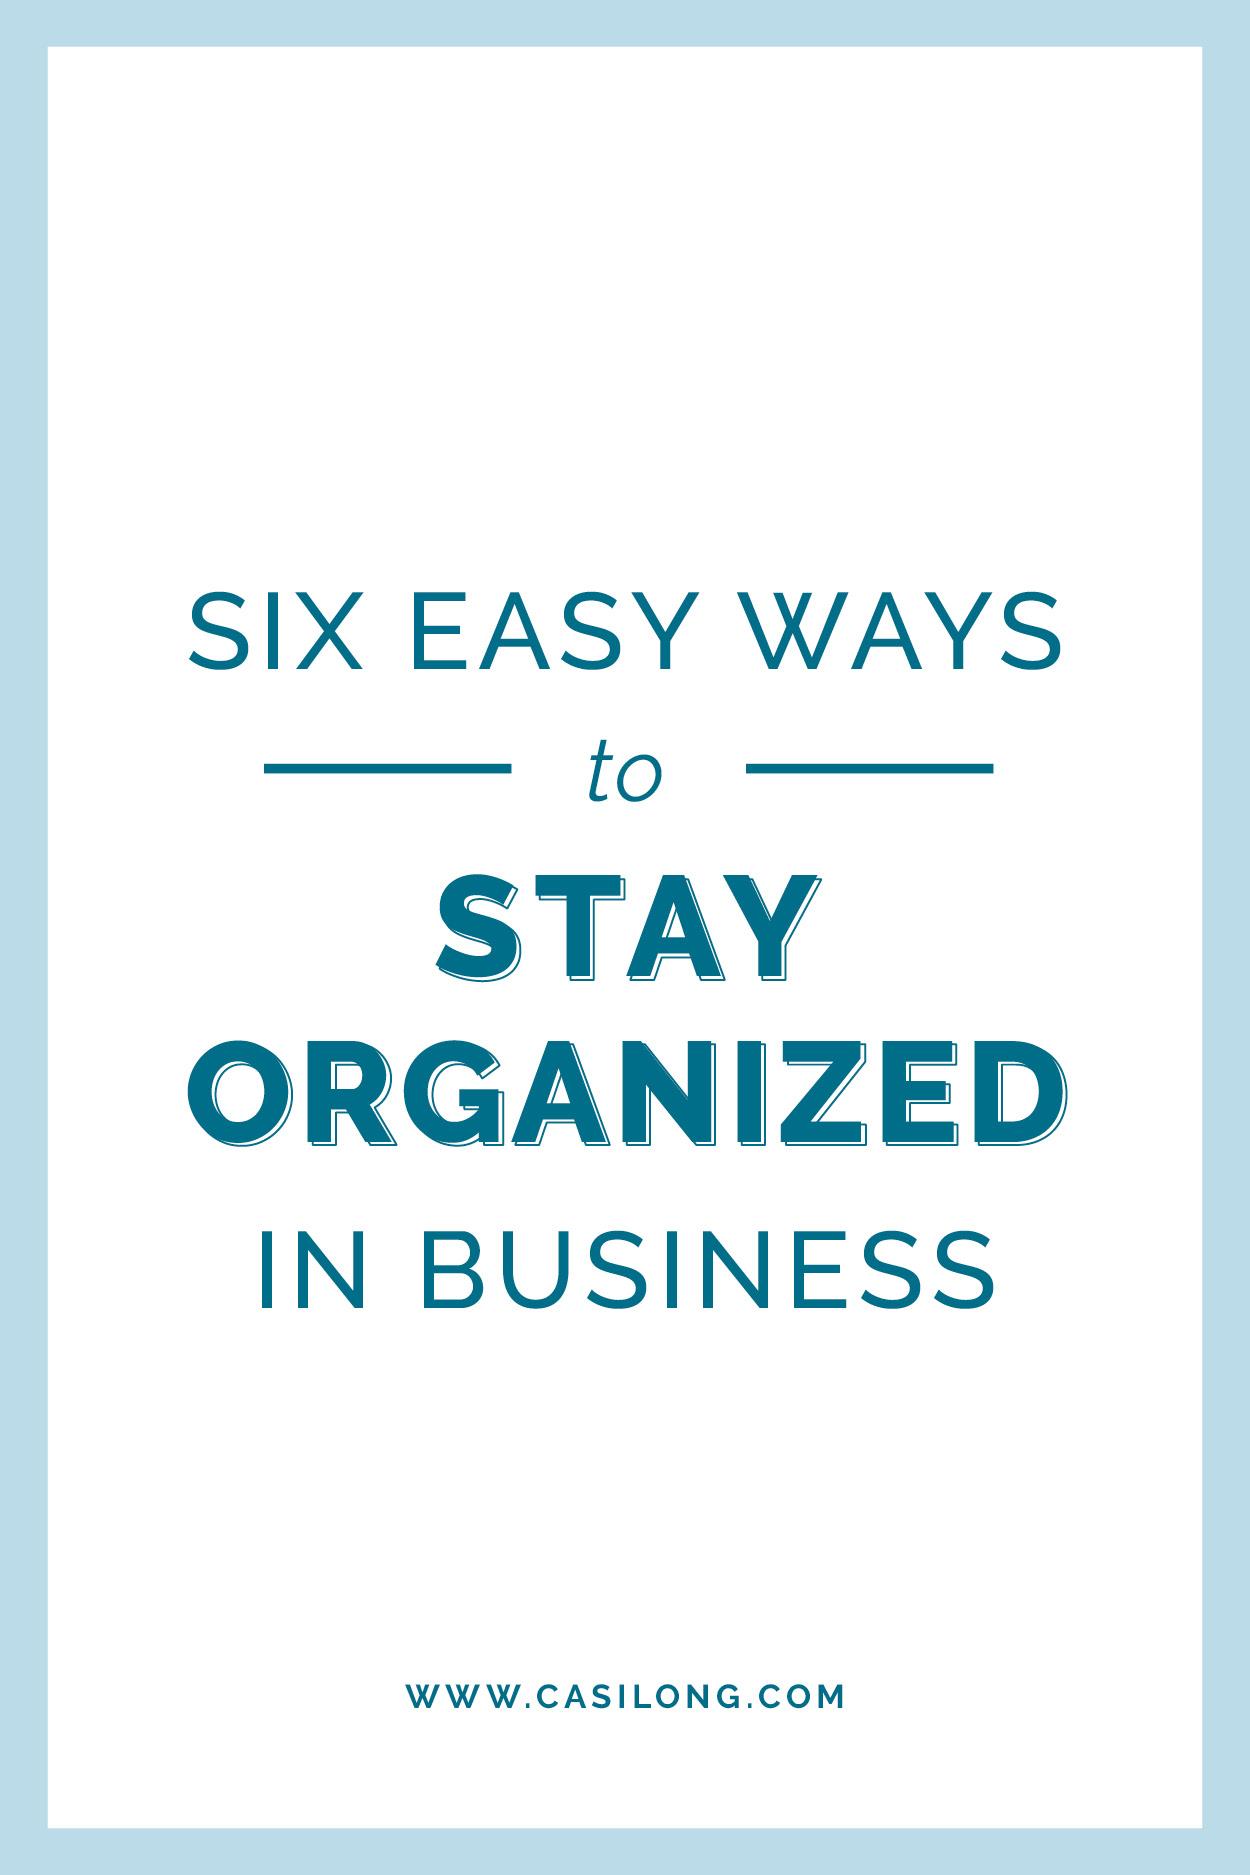 Six ways to stay organized in Business   casilong.com/blog   #casilongdesign #fearlesspursuit